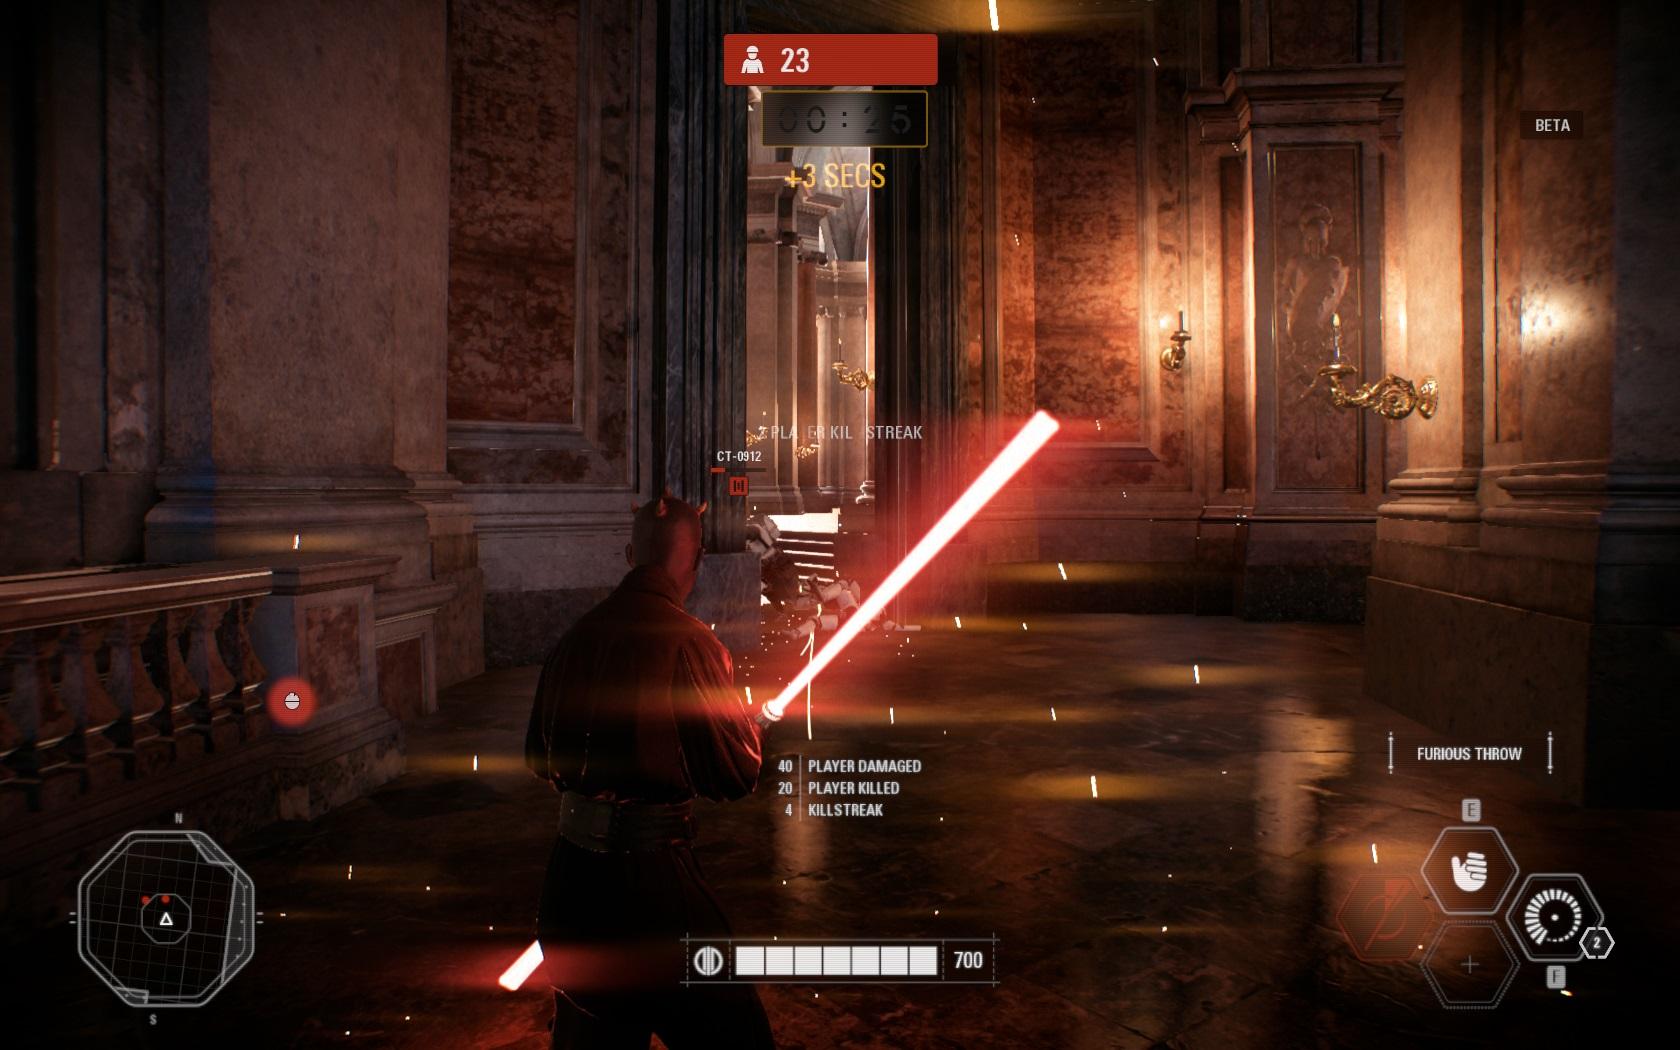 Star Wars: Battlefront 2 - dojmy z bety 150806